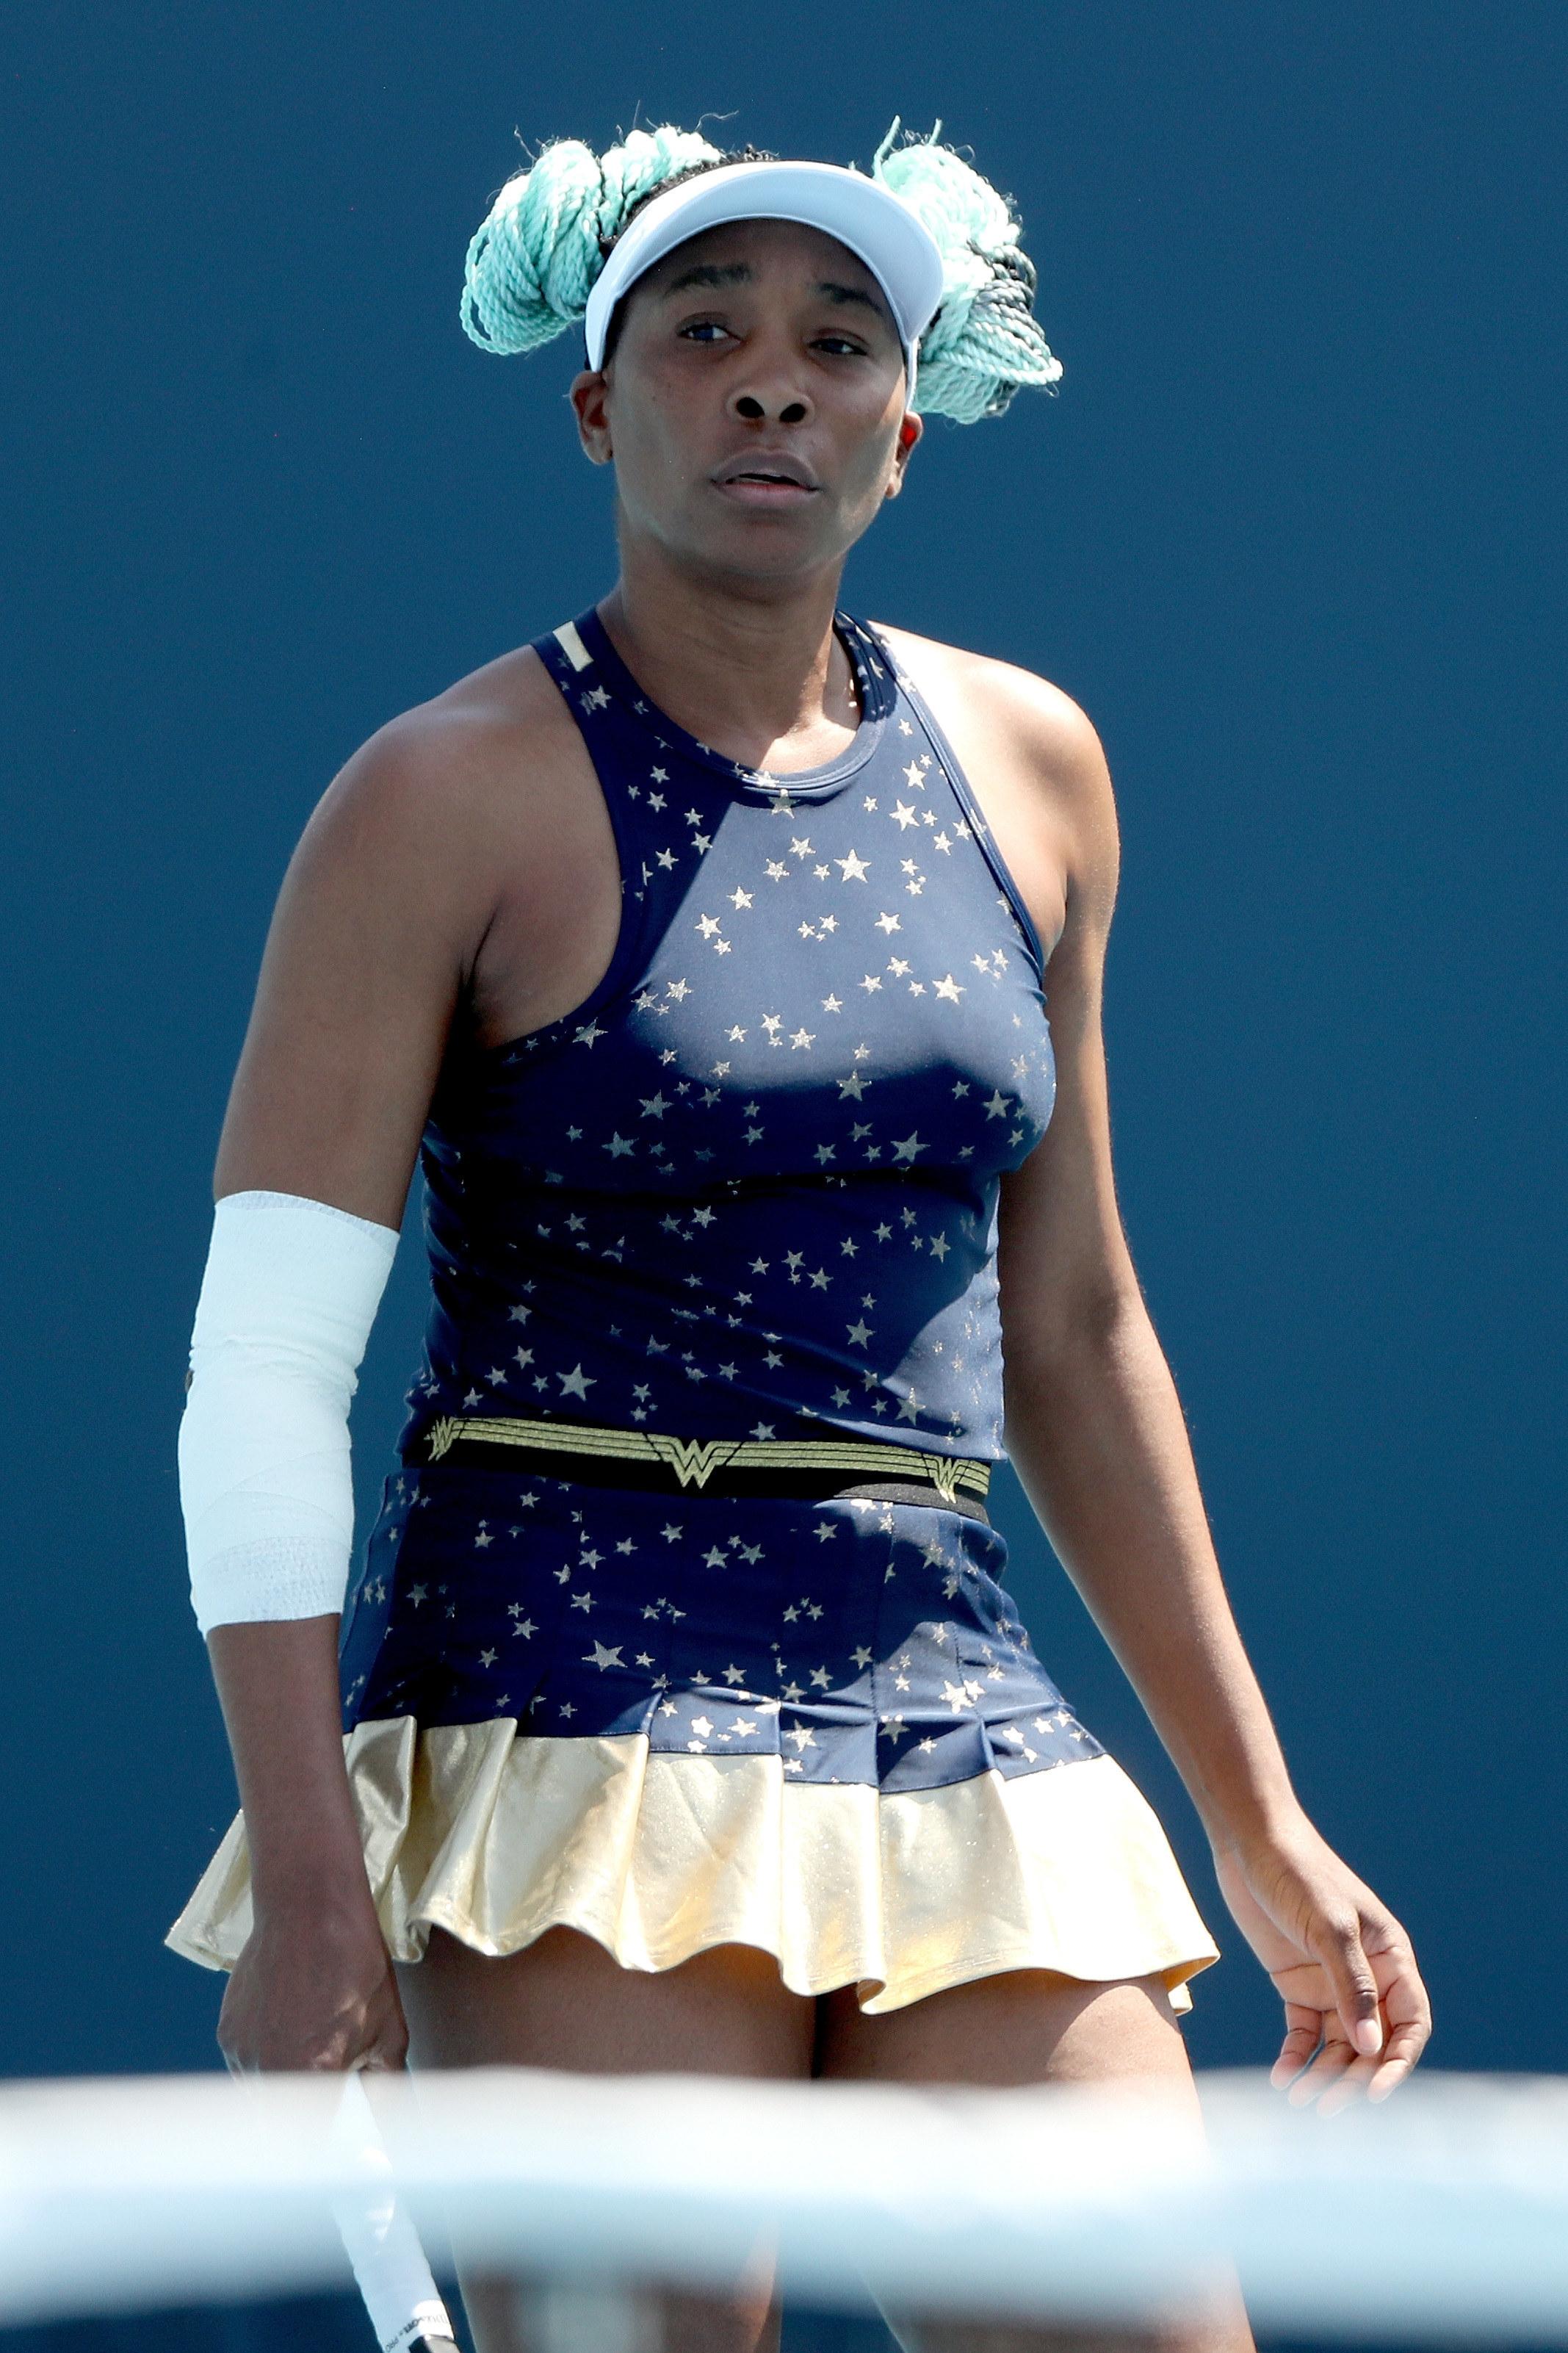 Present day Venus Williams on tennis court.